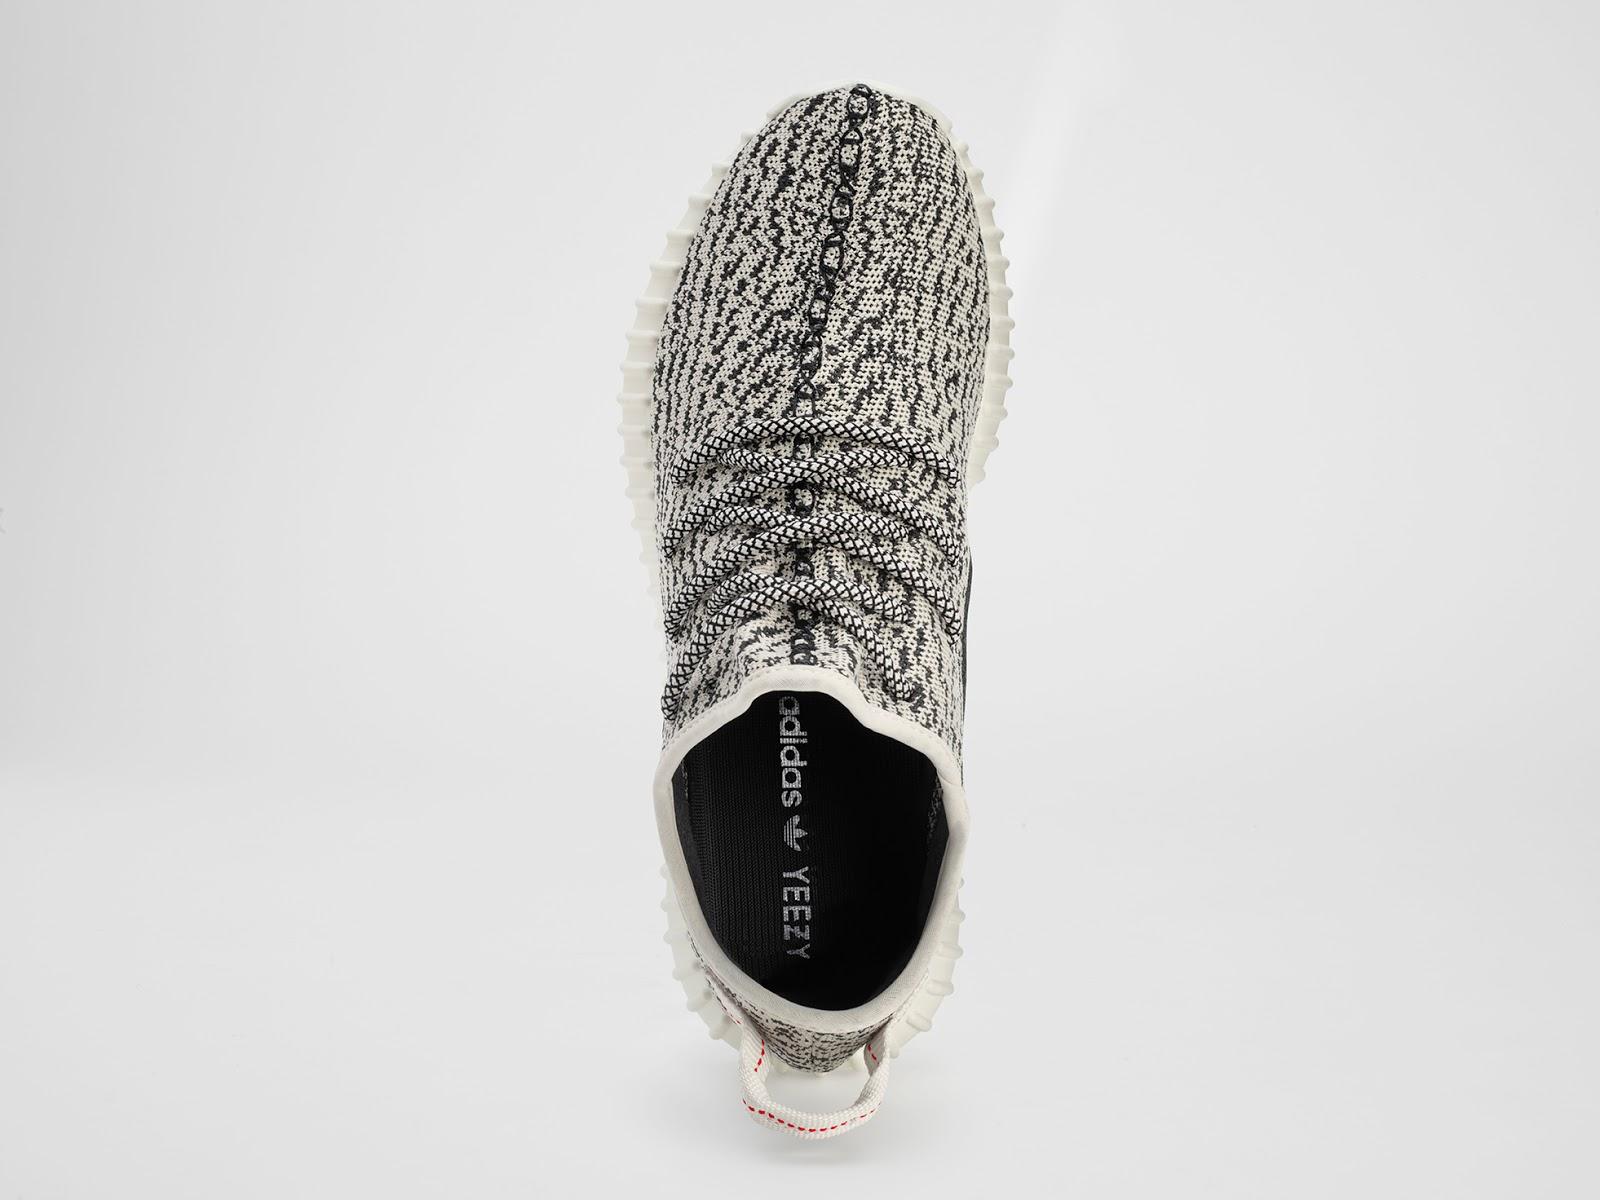 04826ce0 adidas Originals' Yeezy Boost 350 Kanye West